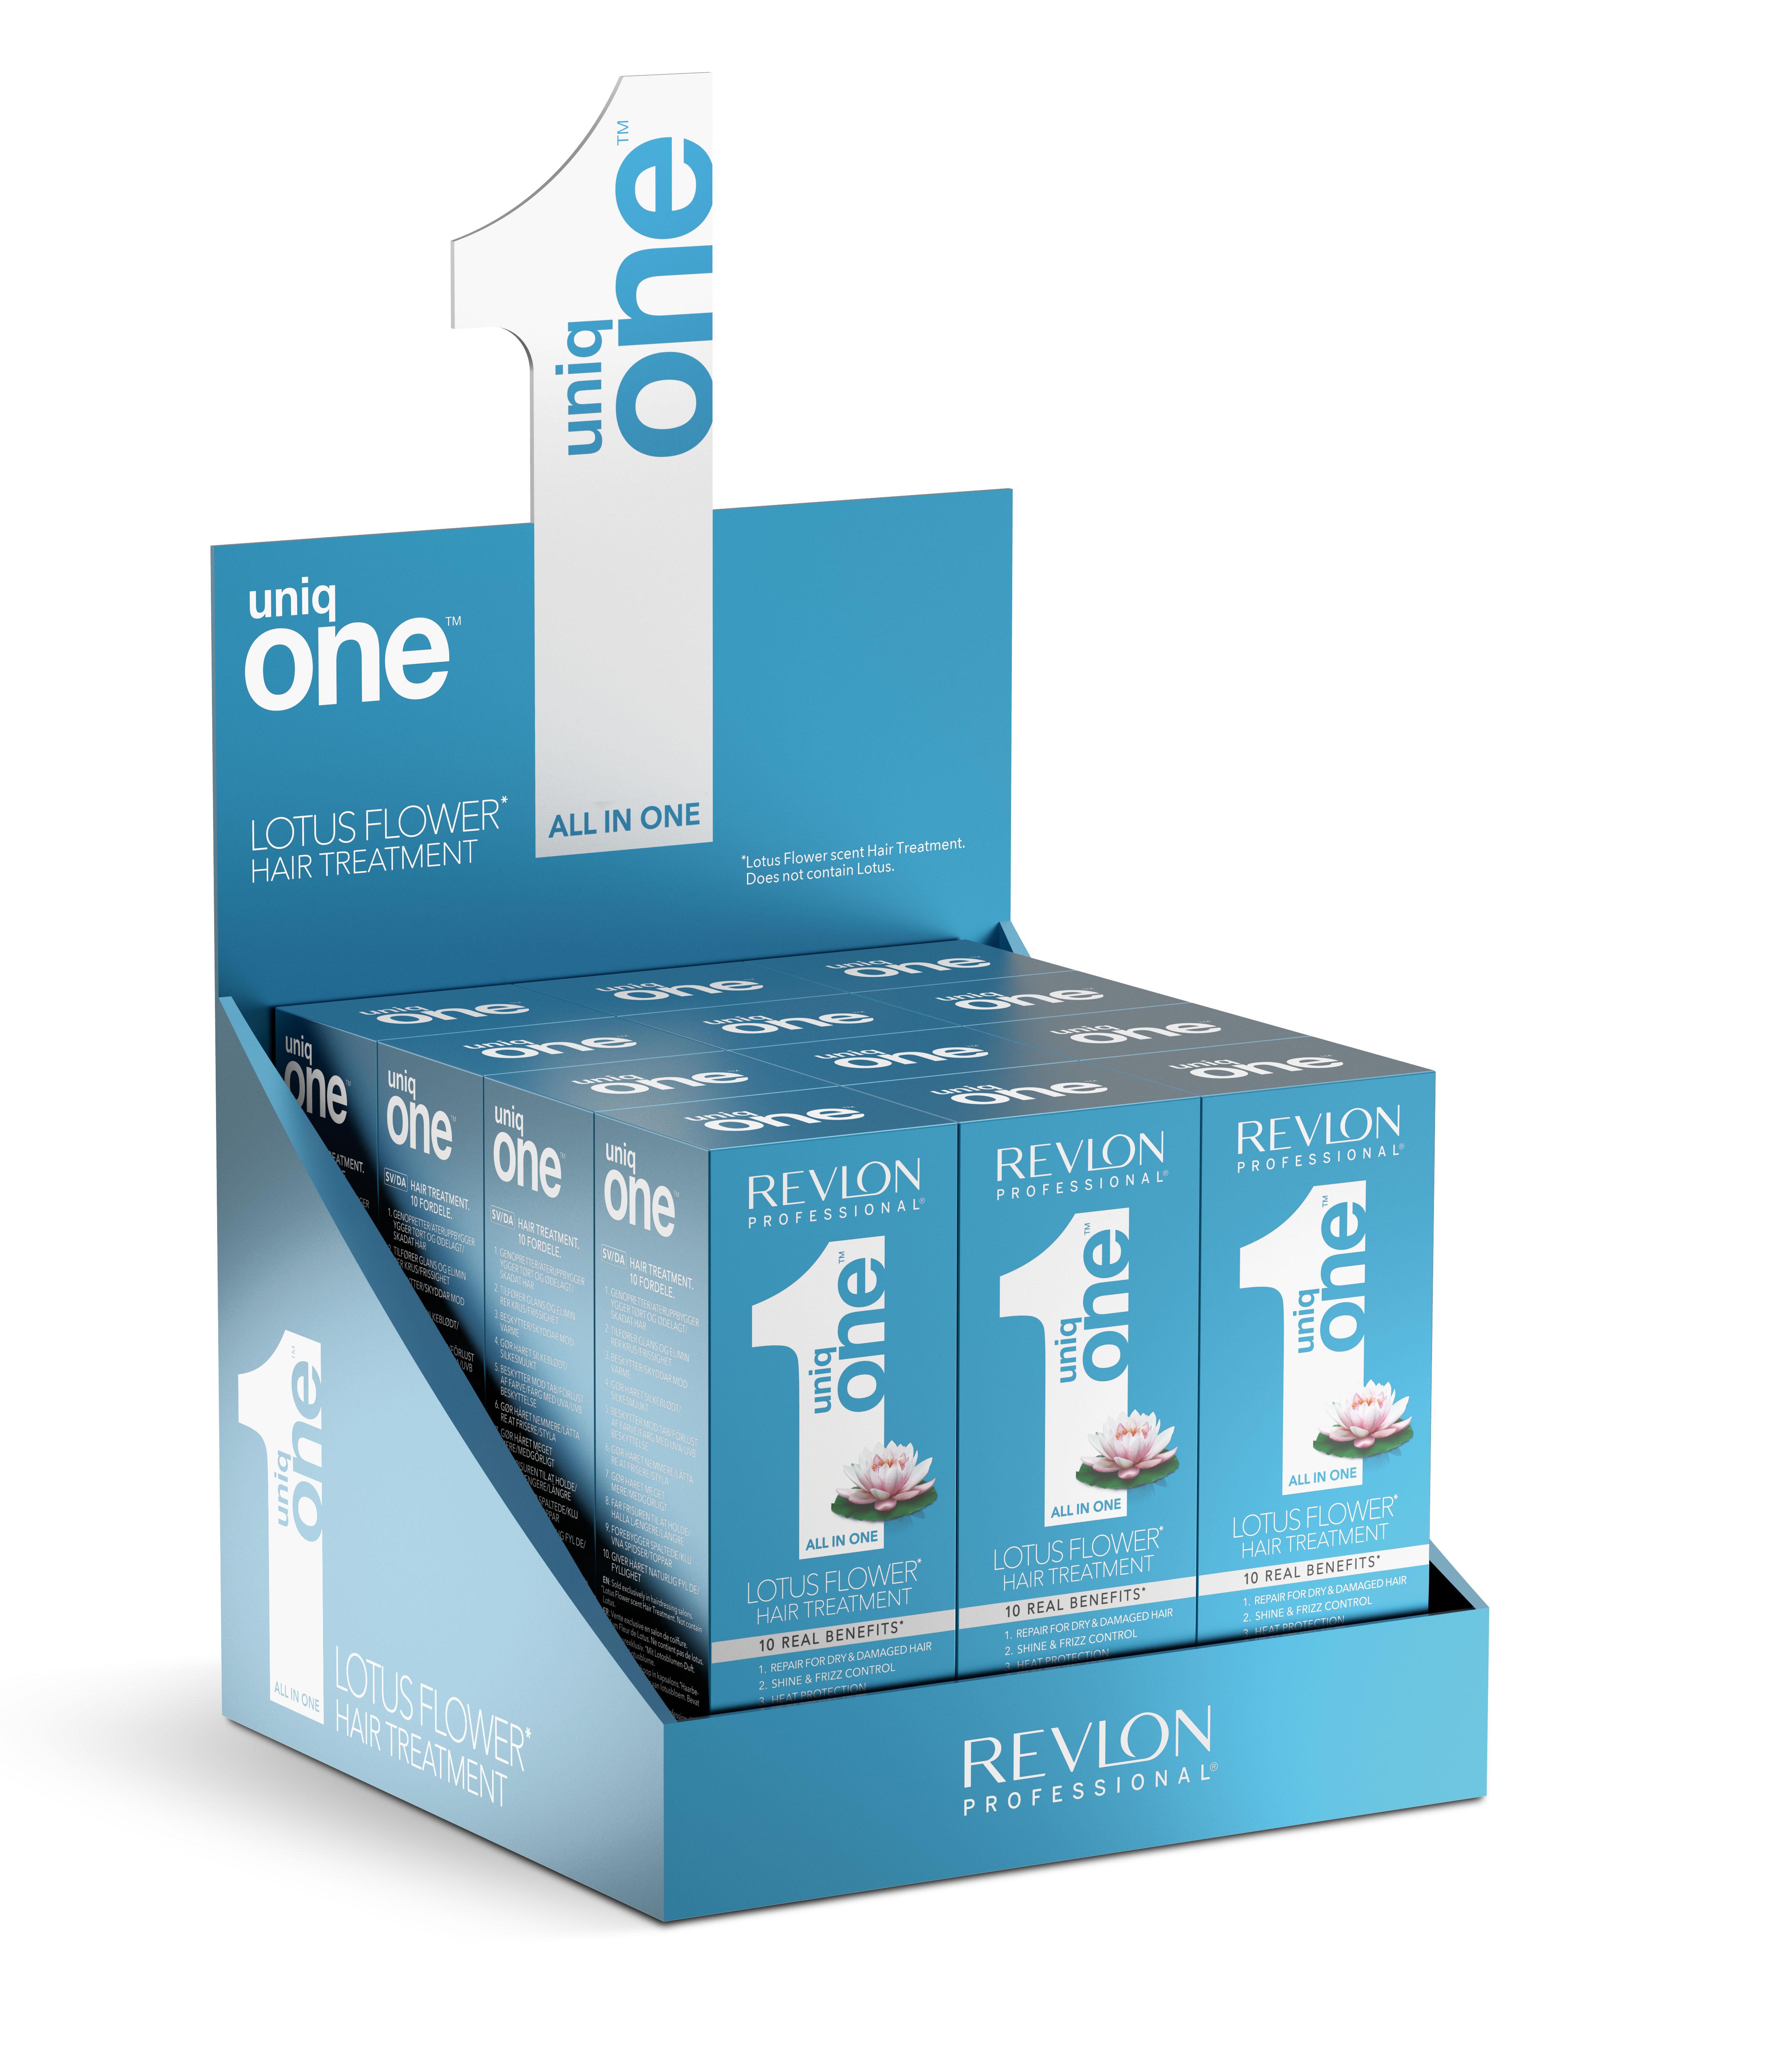 REVLON Professional Набор масок-спрей несмываемая / Uniq One LOTUS 150 мл (1 коробка = 12 шт.)